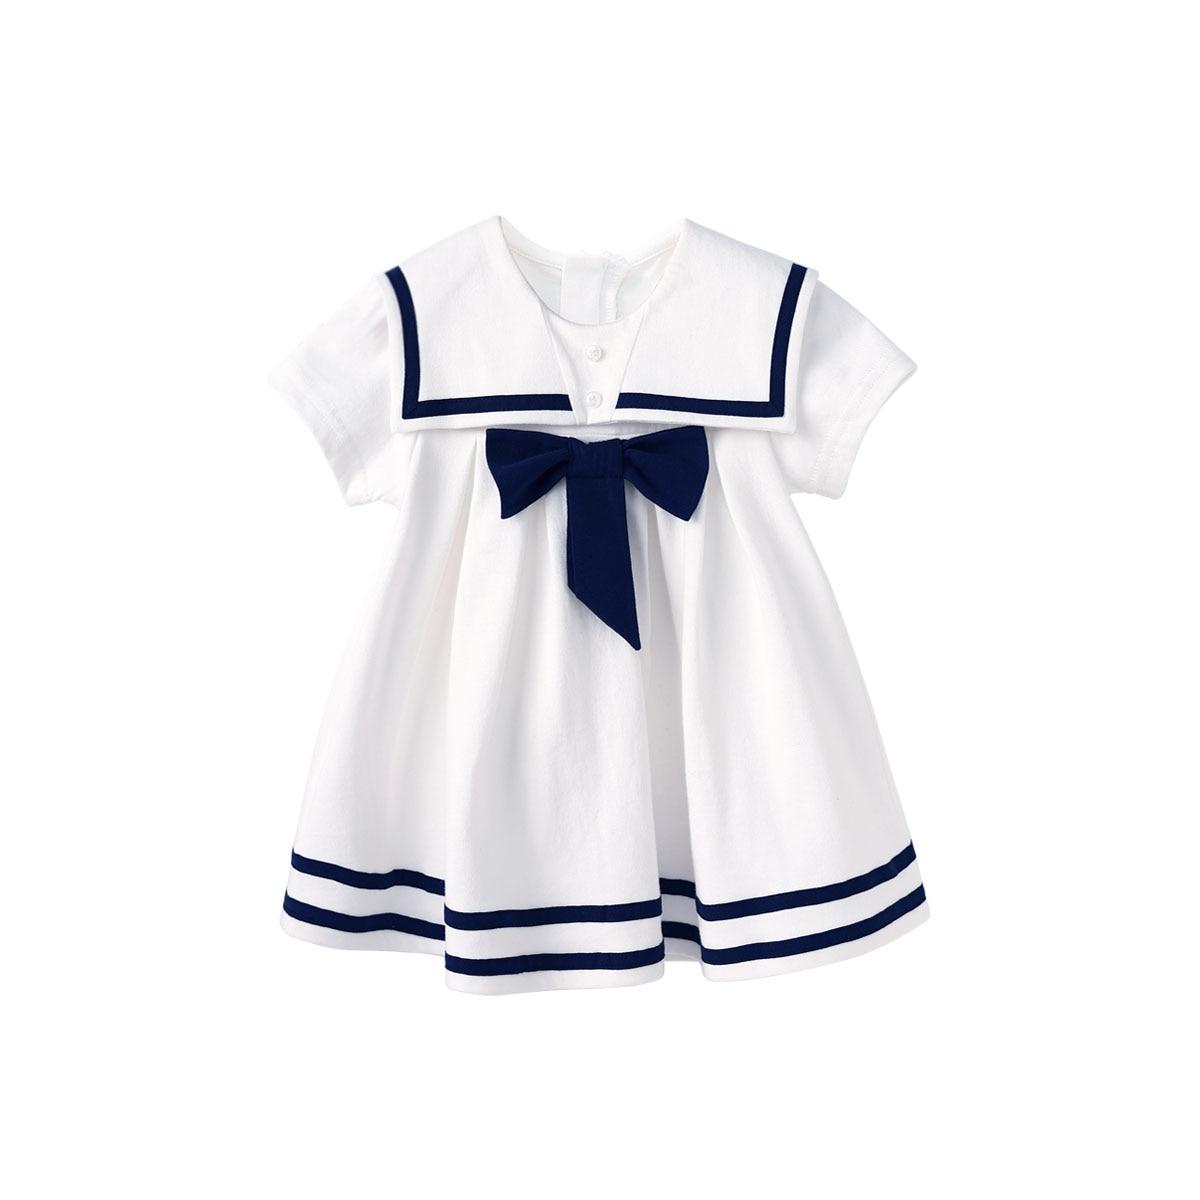 Pureborn Toddler Infant Baby Girl Sailor Dress Bowknot Sailor Collar Summer Breathable Cotton Beach Holiday Baby Girl Clothes